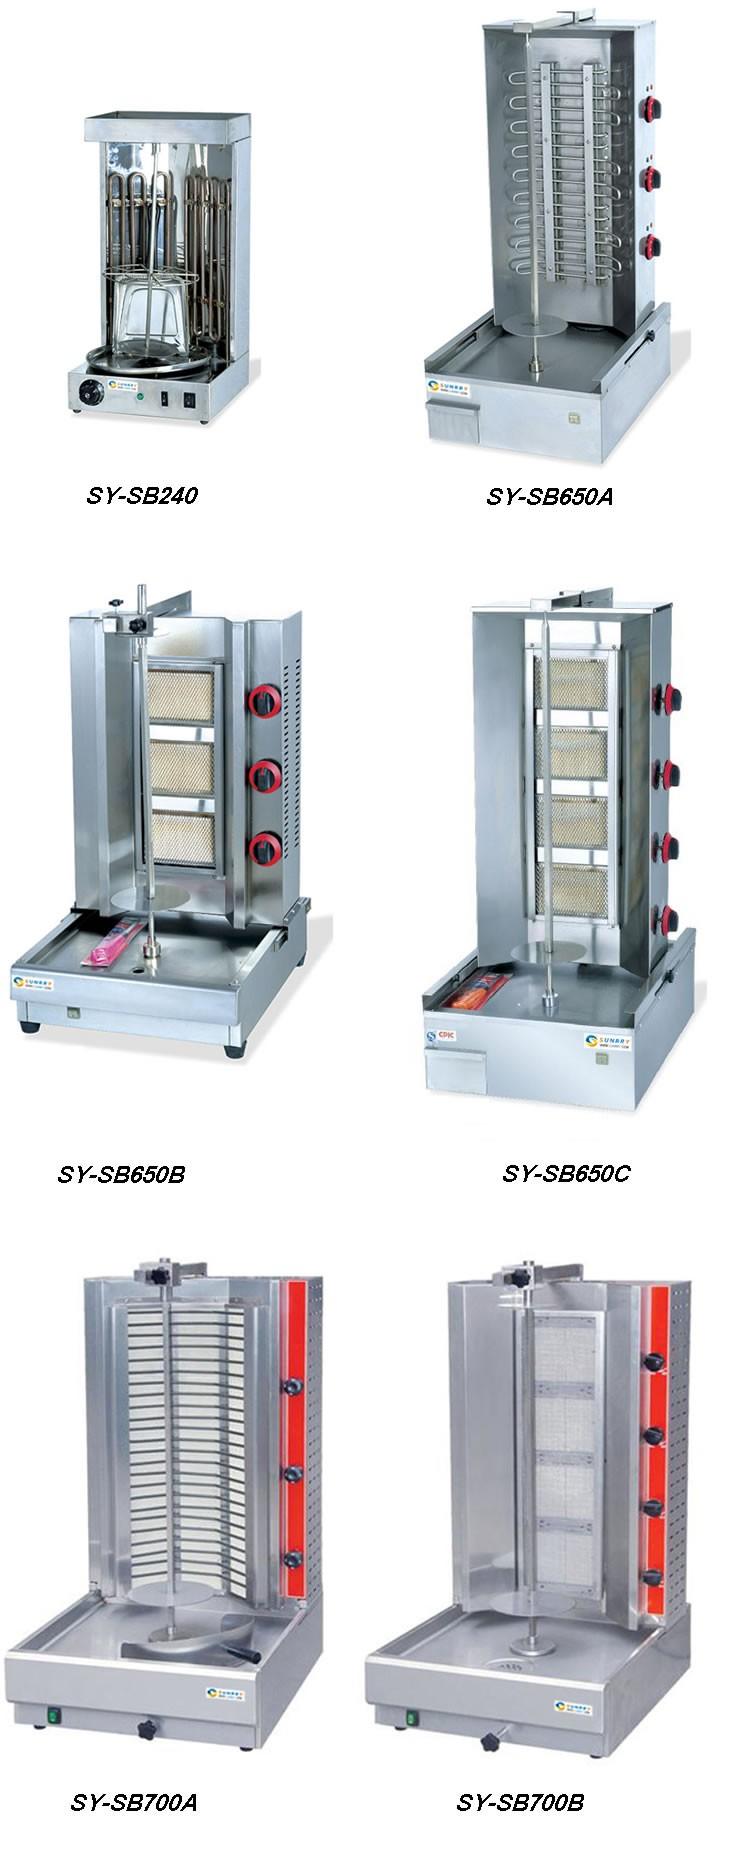 Electric shawarma machine for sale - high quality shawarma ...